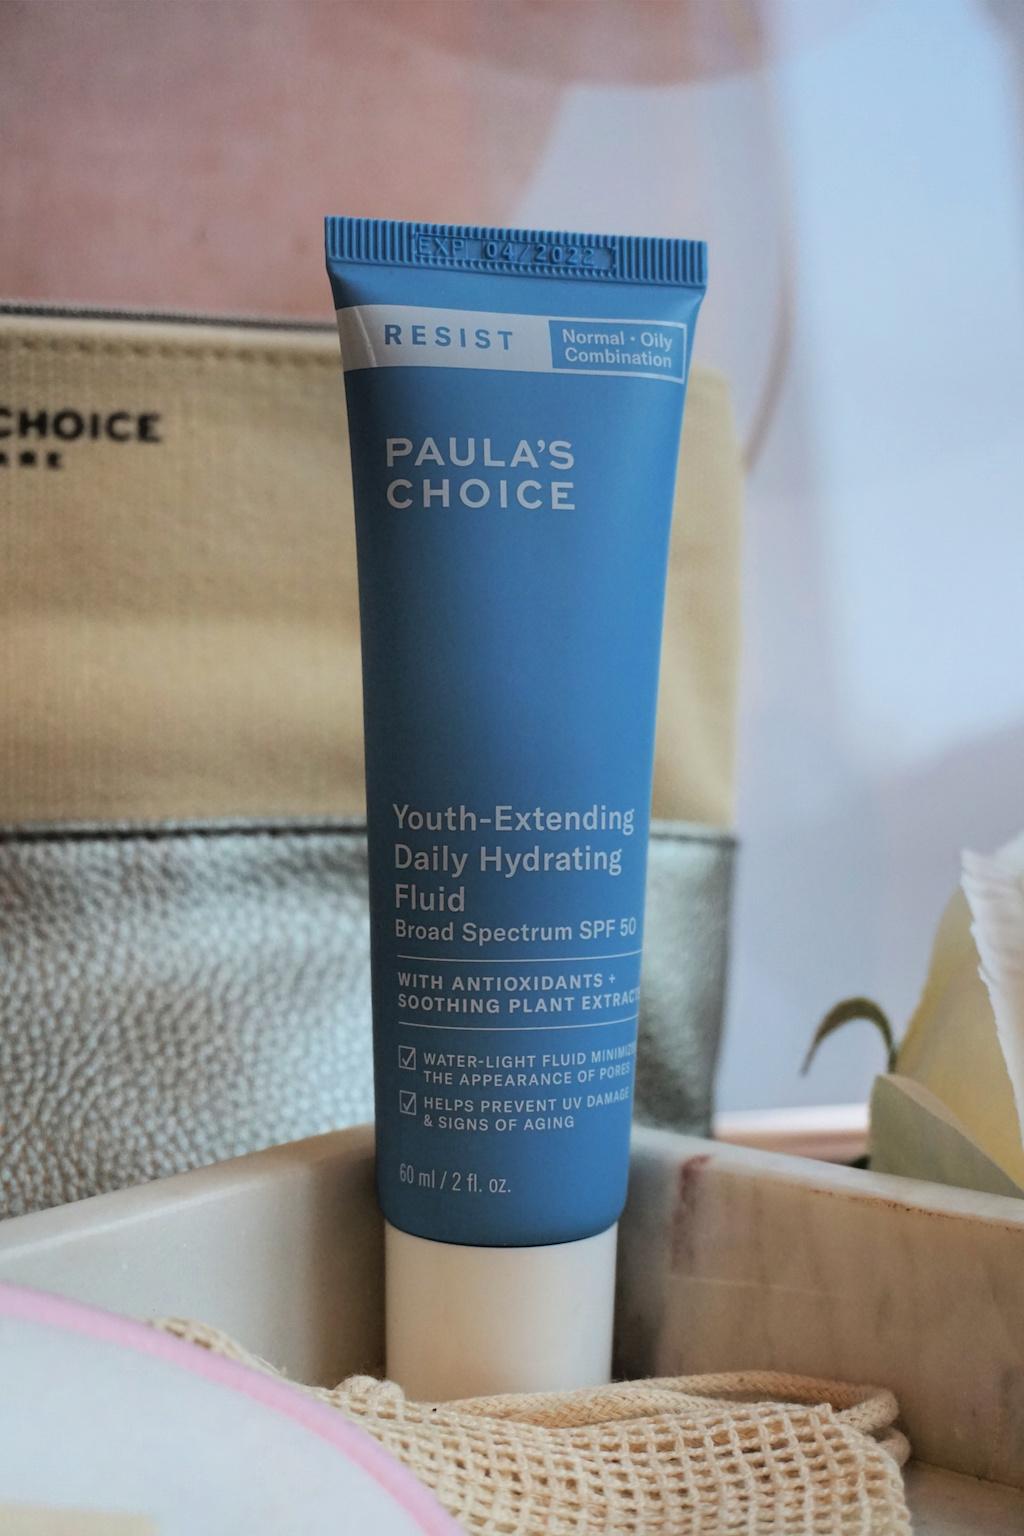 Paula's Choice Resist Youth-Extending Daily Hydrating Fluid